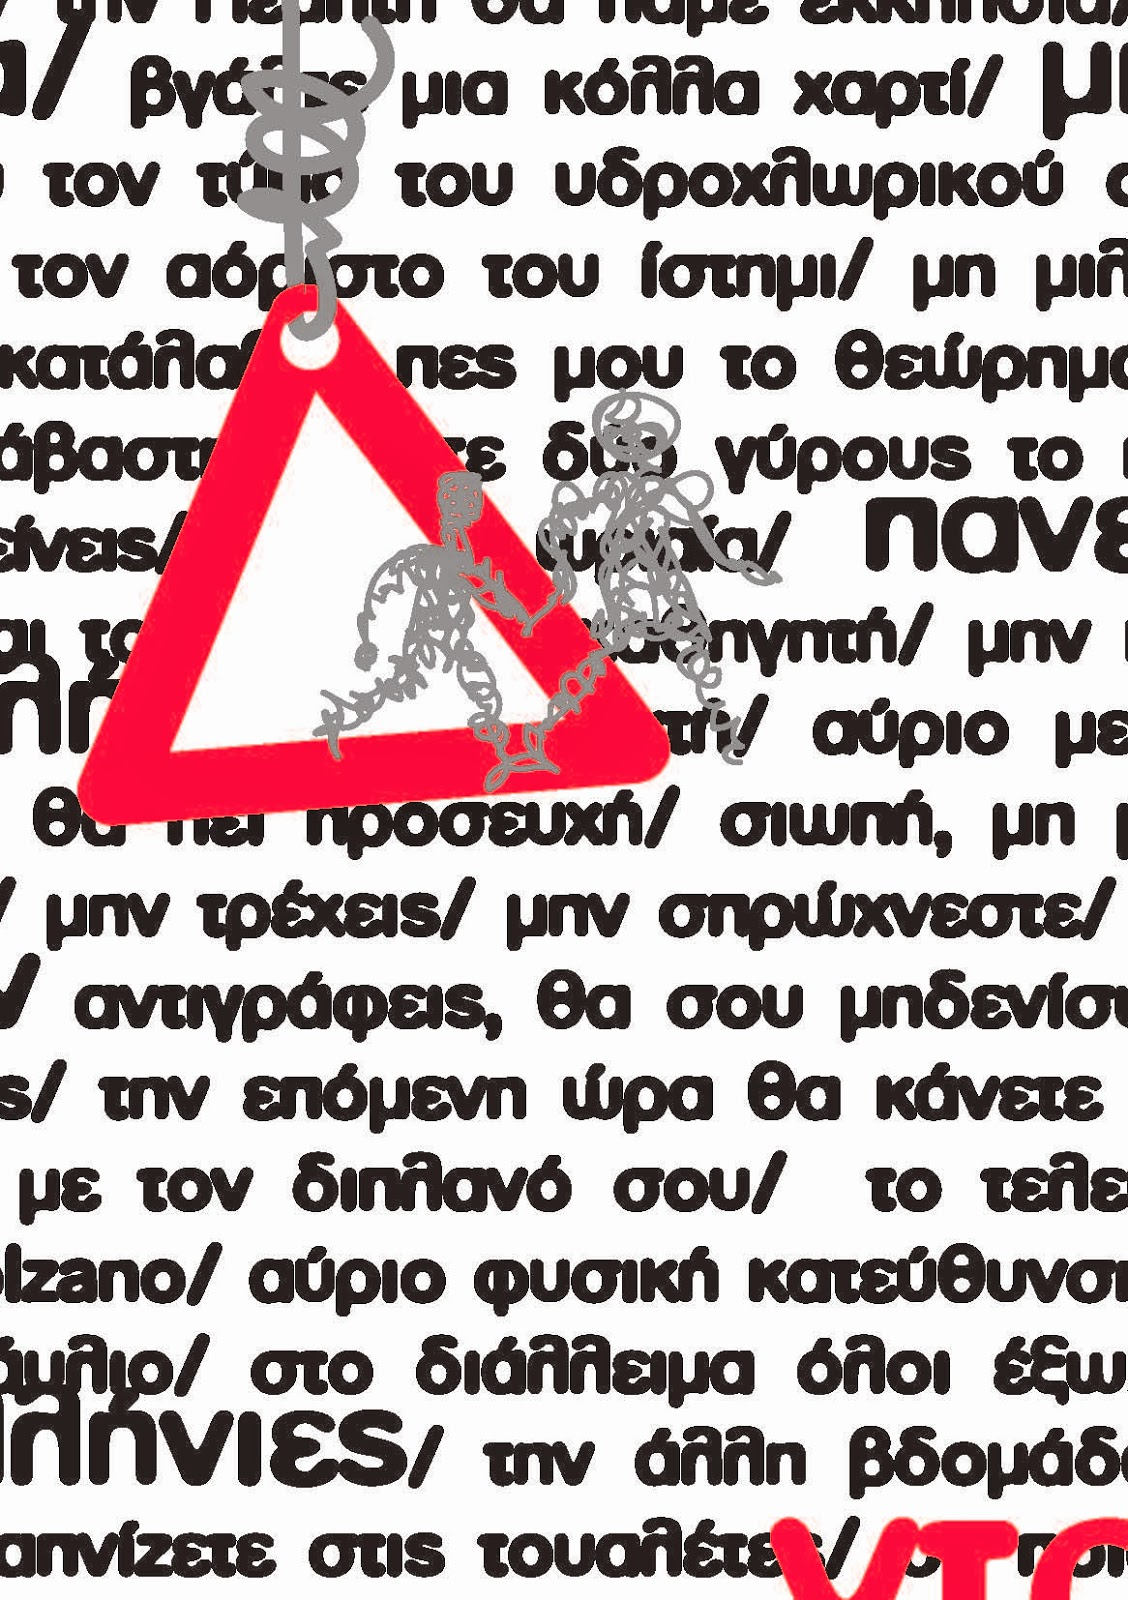 Eισήγηση από την εκδήλωση του Πειρά(γ)ματος και των Rage Against The School Machine 15-02-2014